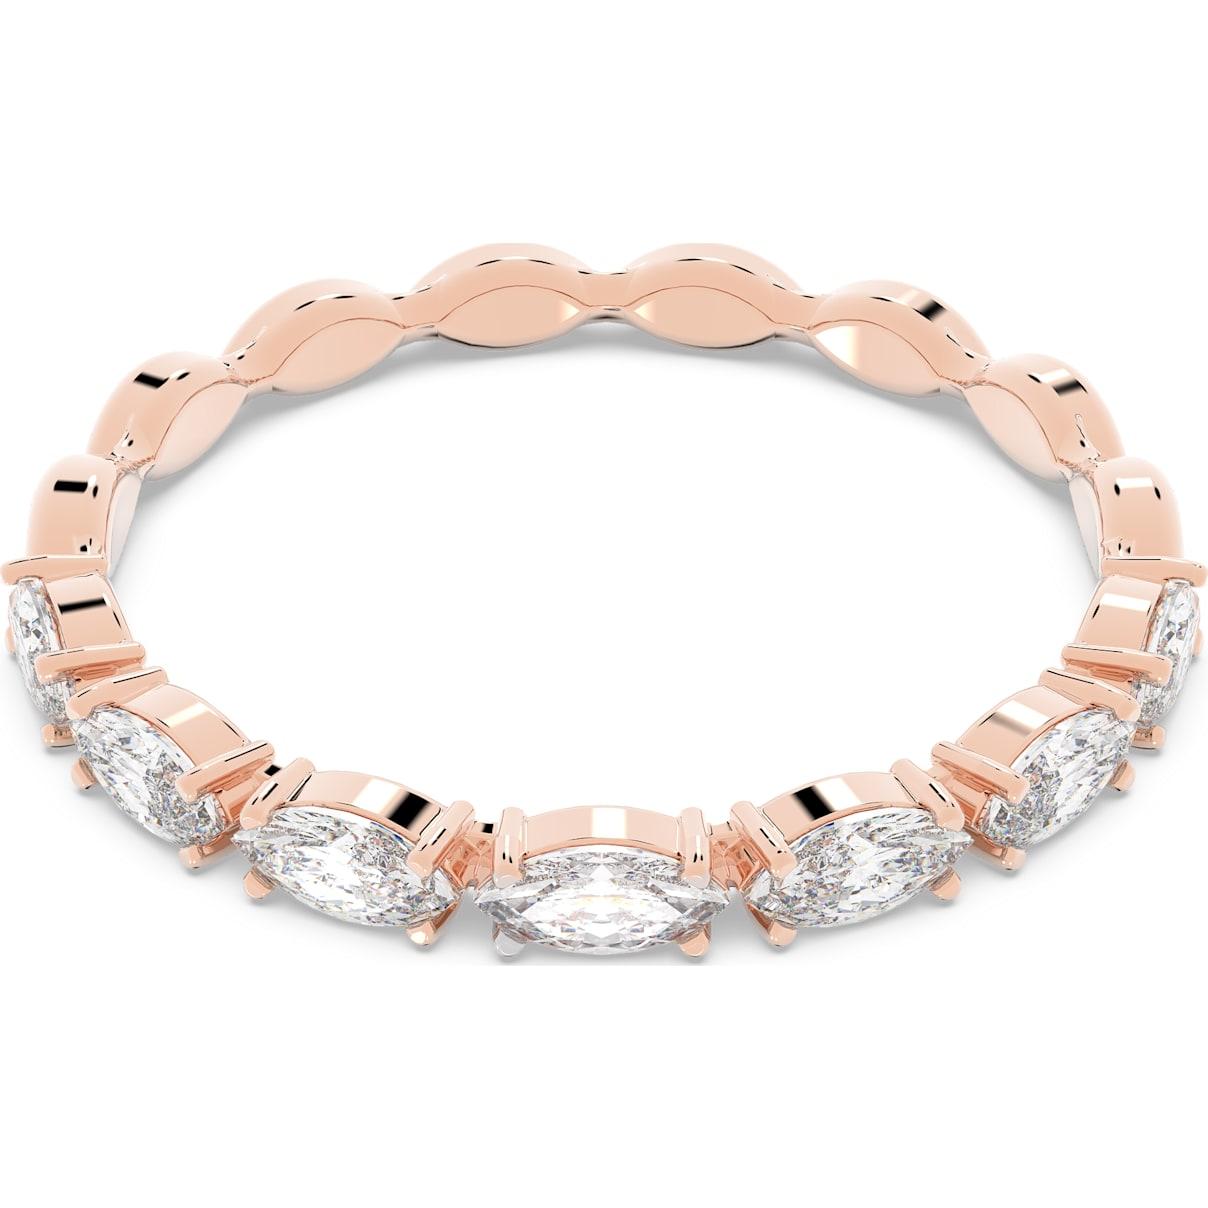 Swarovski Vittore Marquise Ring, White, Rose-gold tone plated